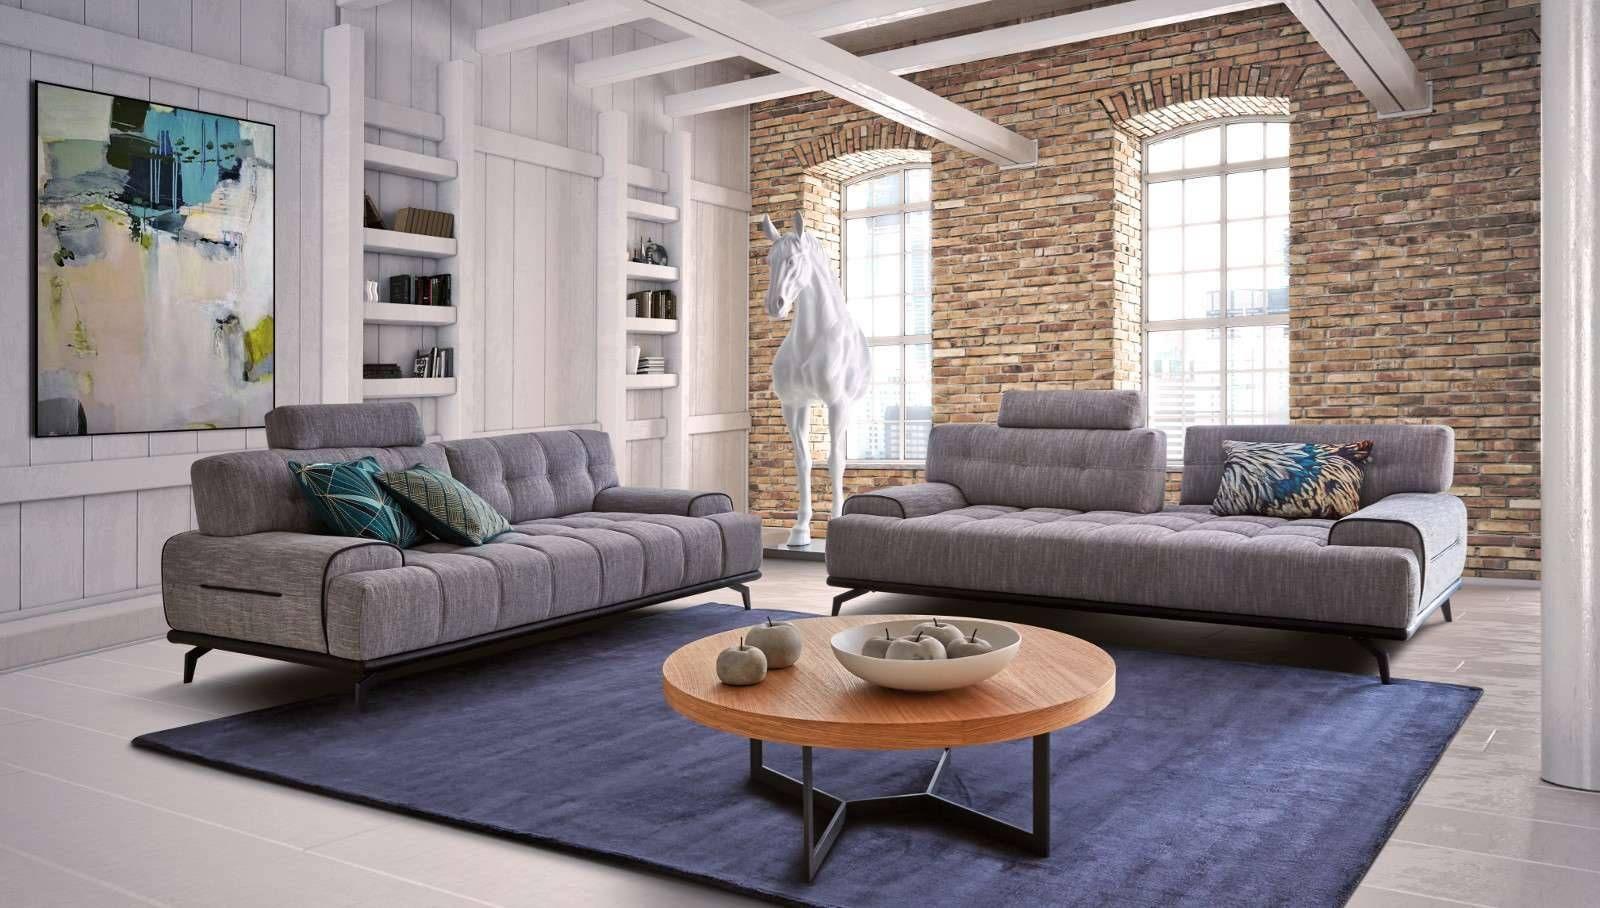 Xxl Meubles Canape Xxl Meubles Salon Upload Xxl Maison Canapes Pinterest In 2020 Home Decor Scandinavian Sofas Furniture